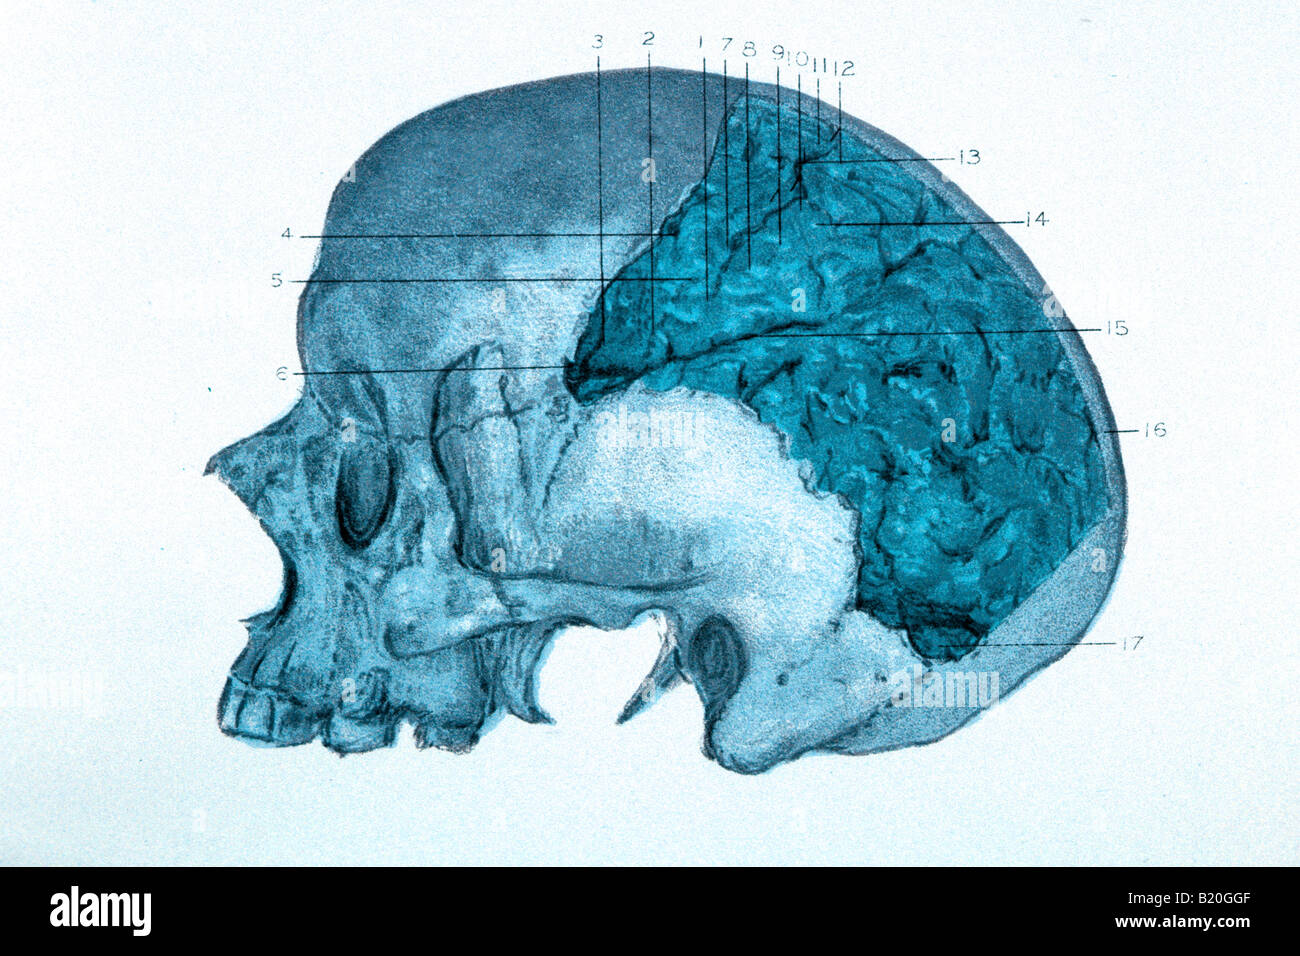 ILLUSTRATION SKULL WITH CEREBRAL HEMISPHERE SHOWN - Stock Image